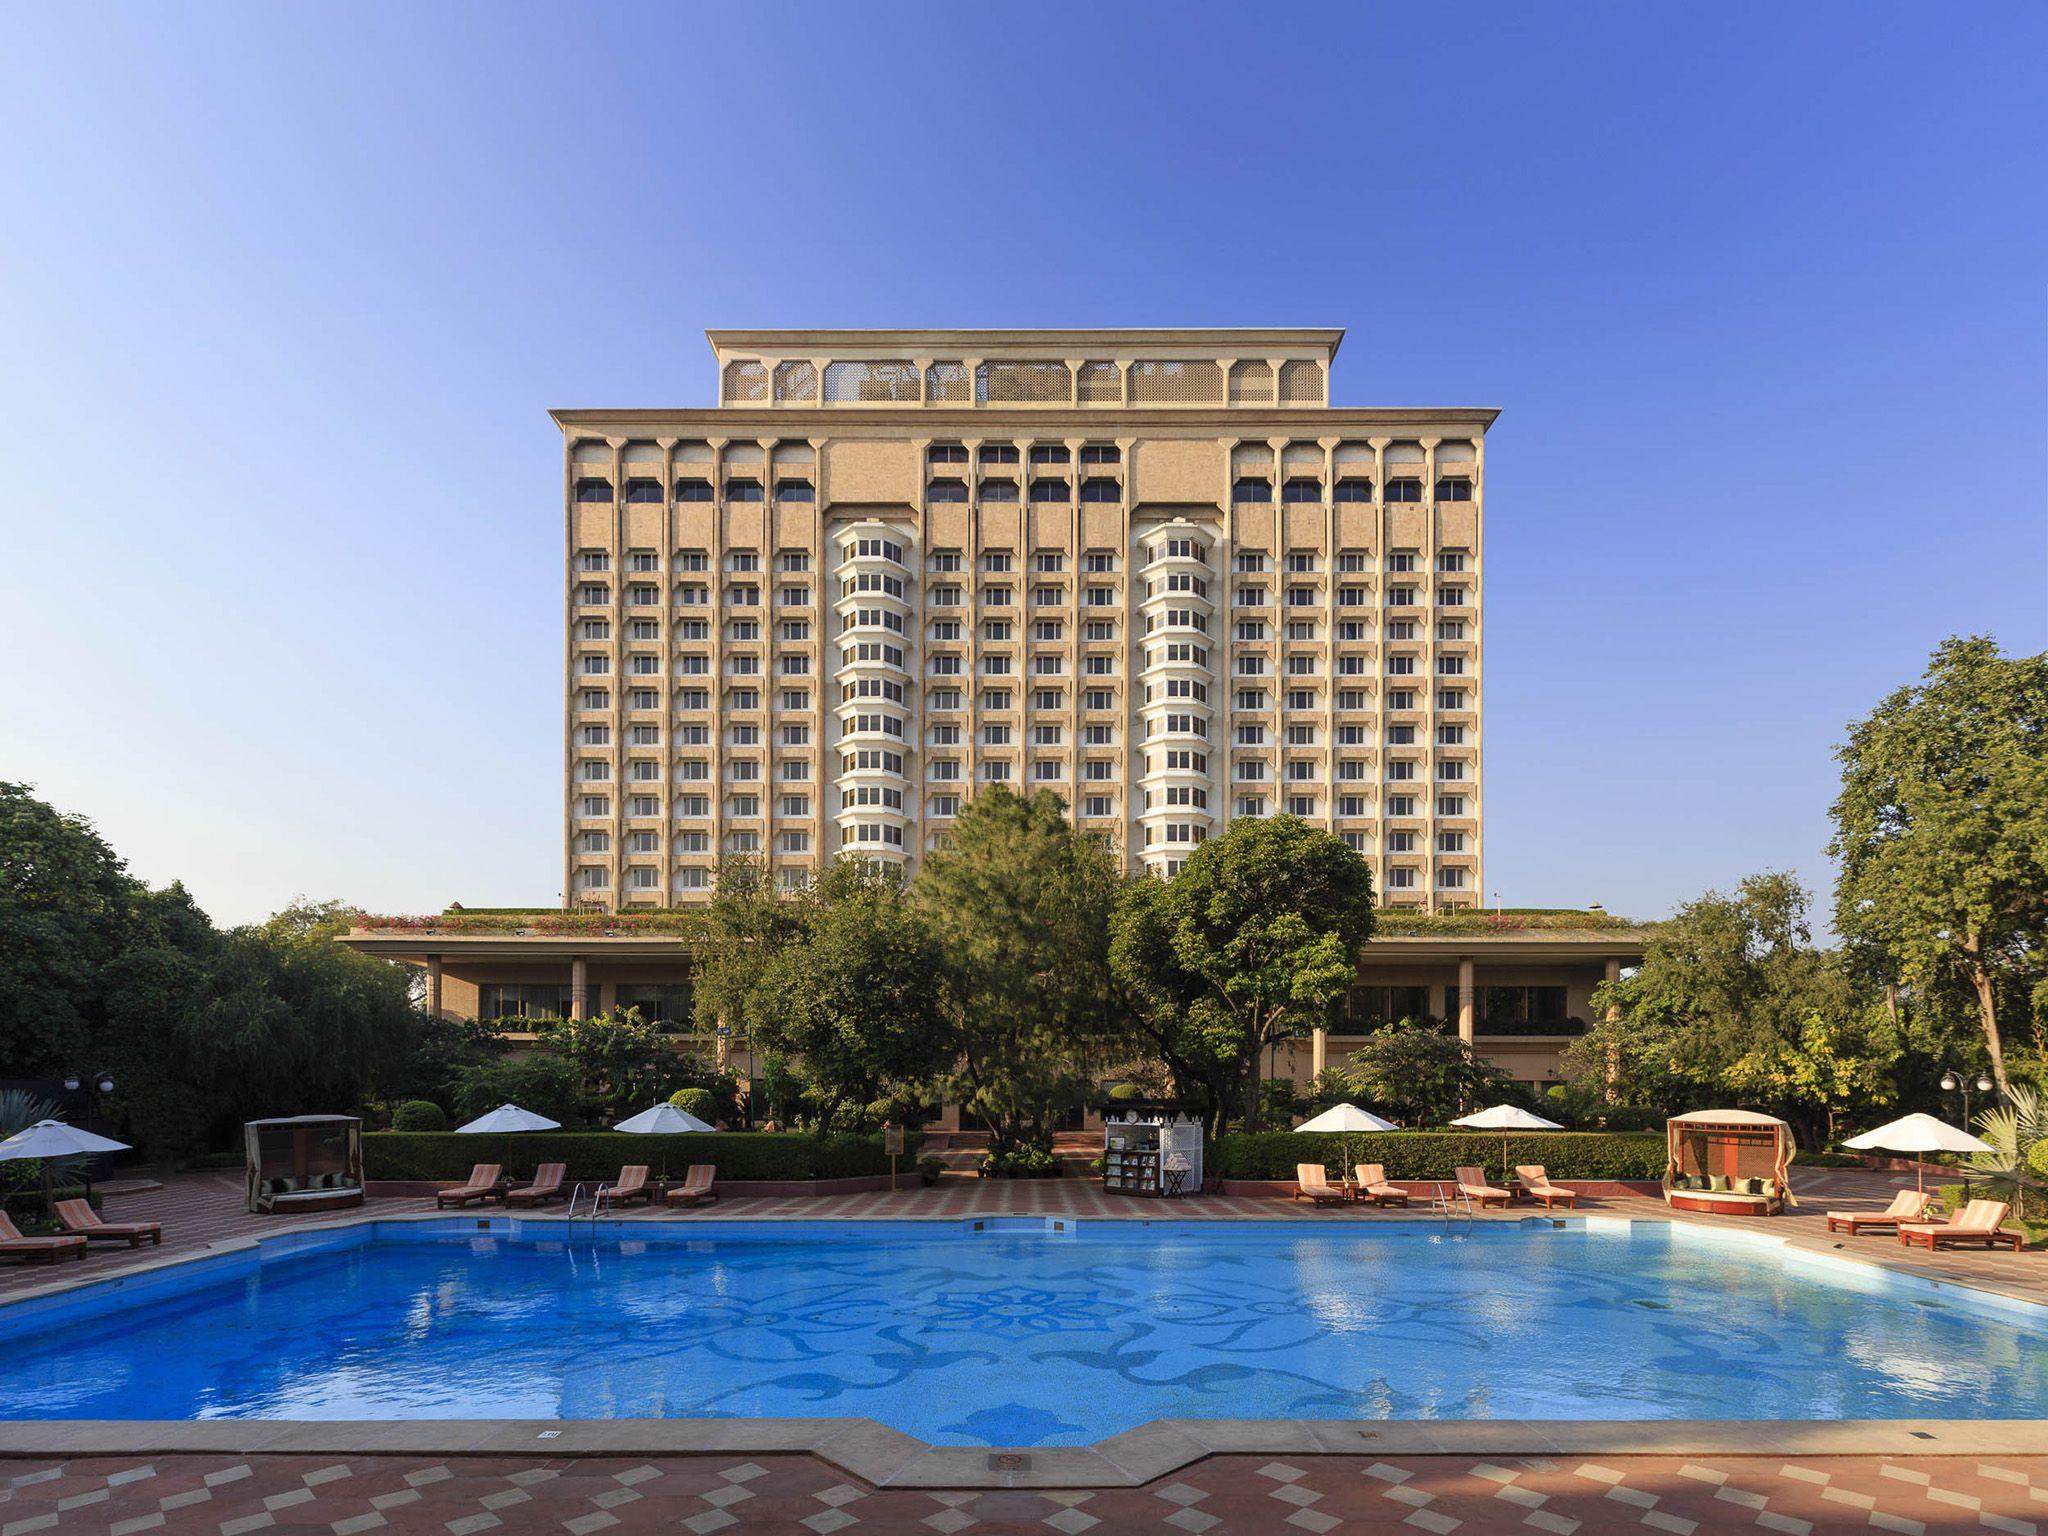 the taj mahal hotel - Hotel